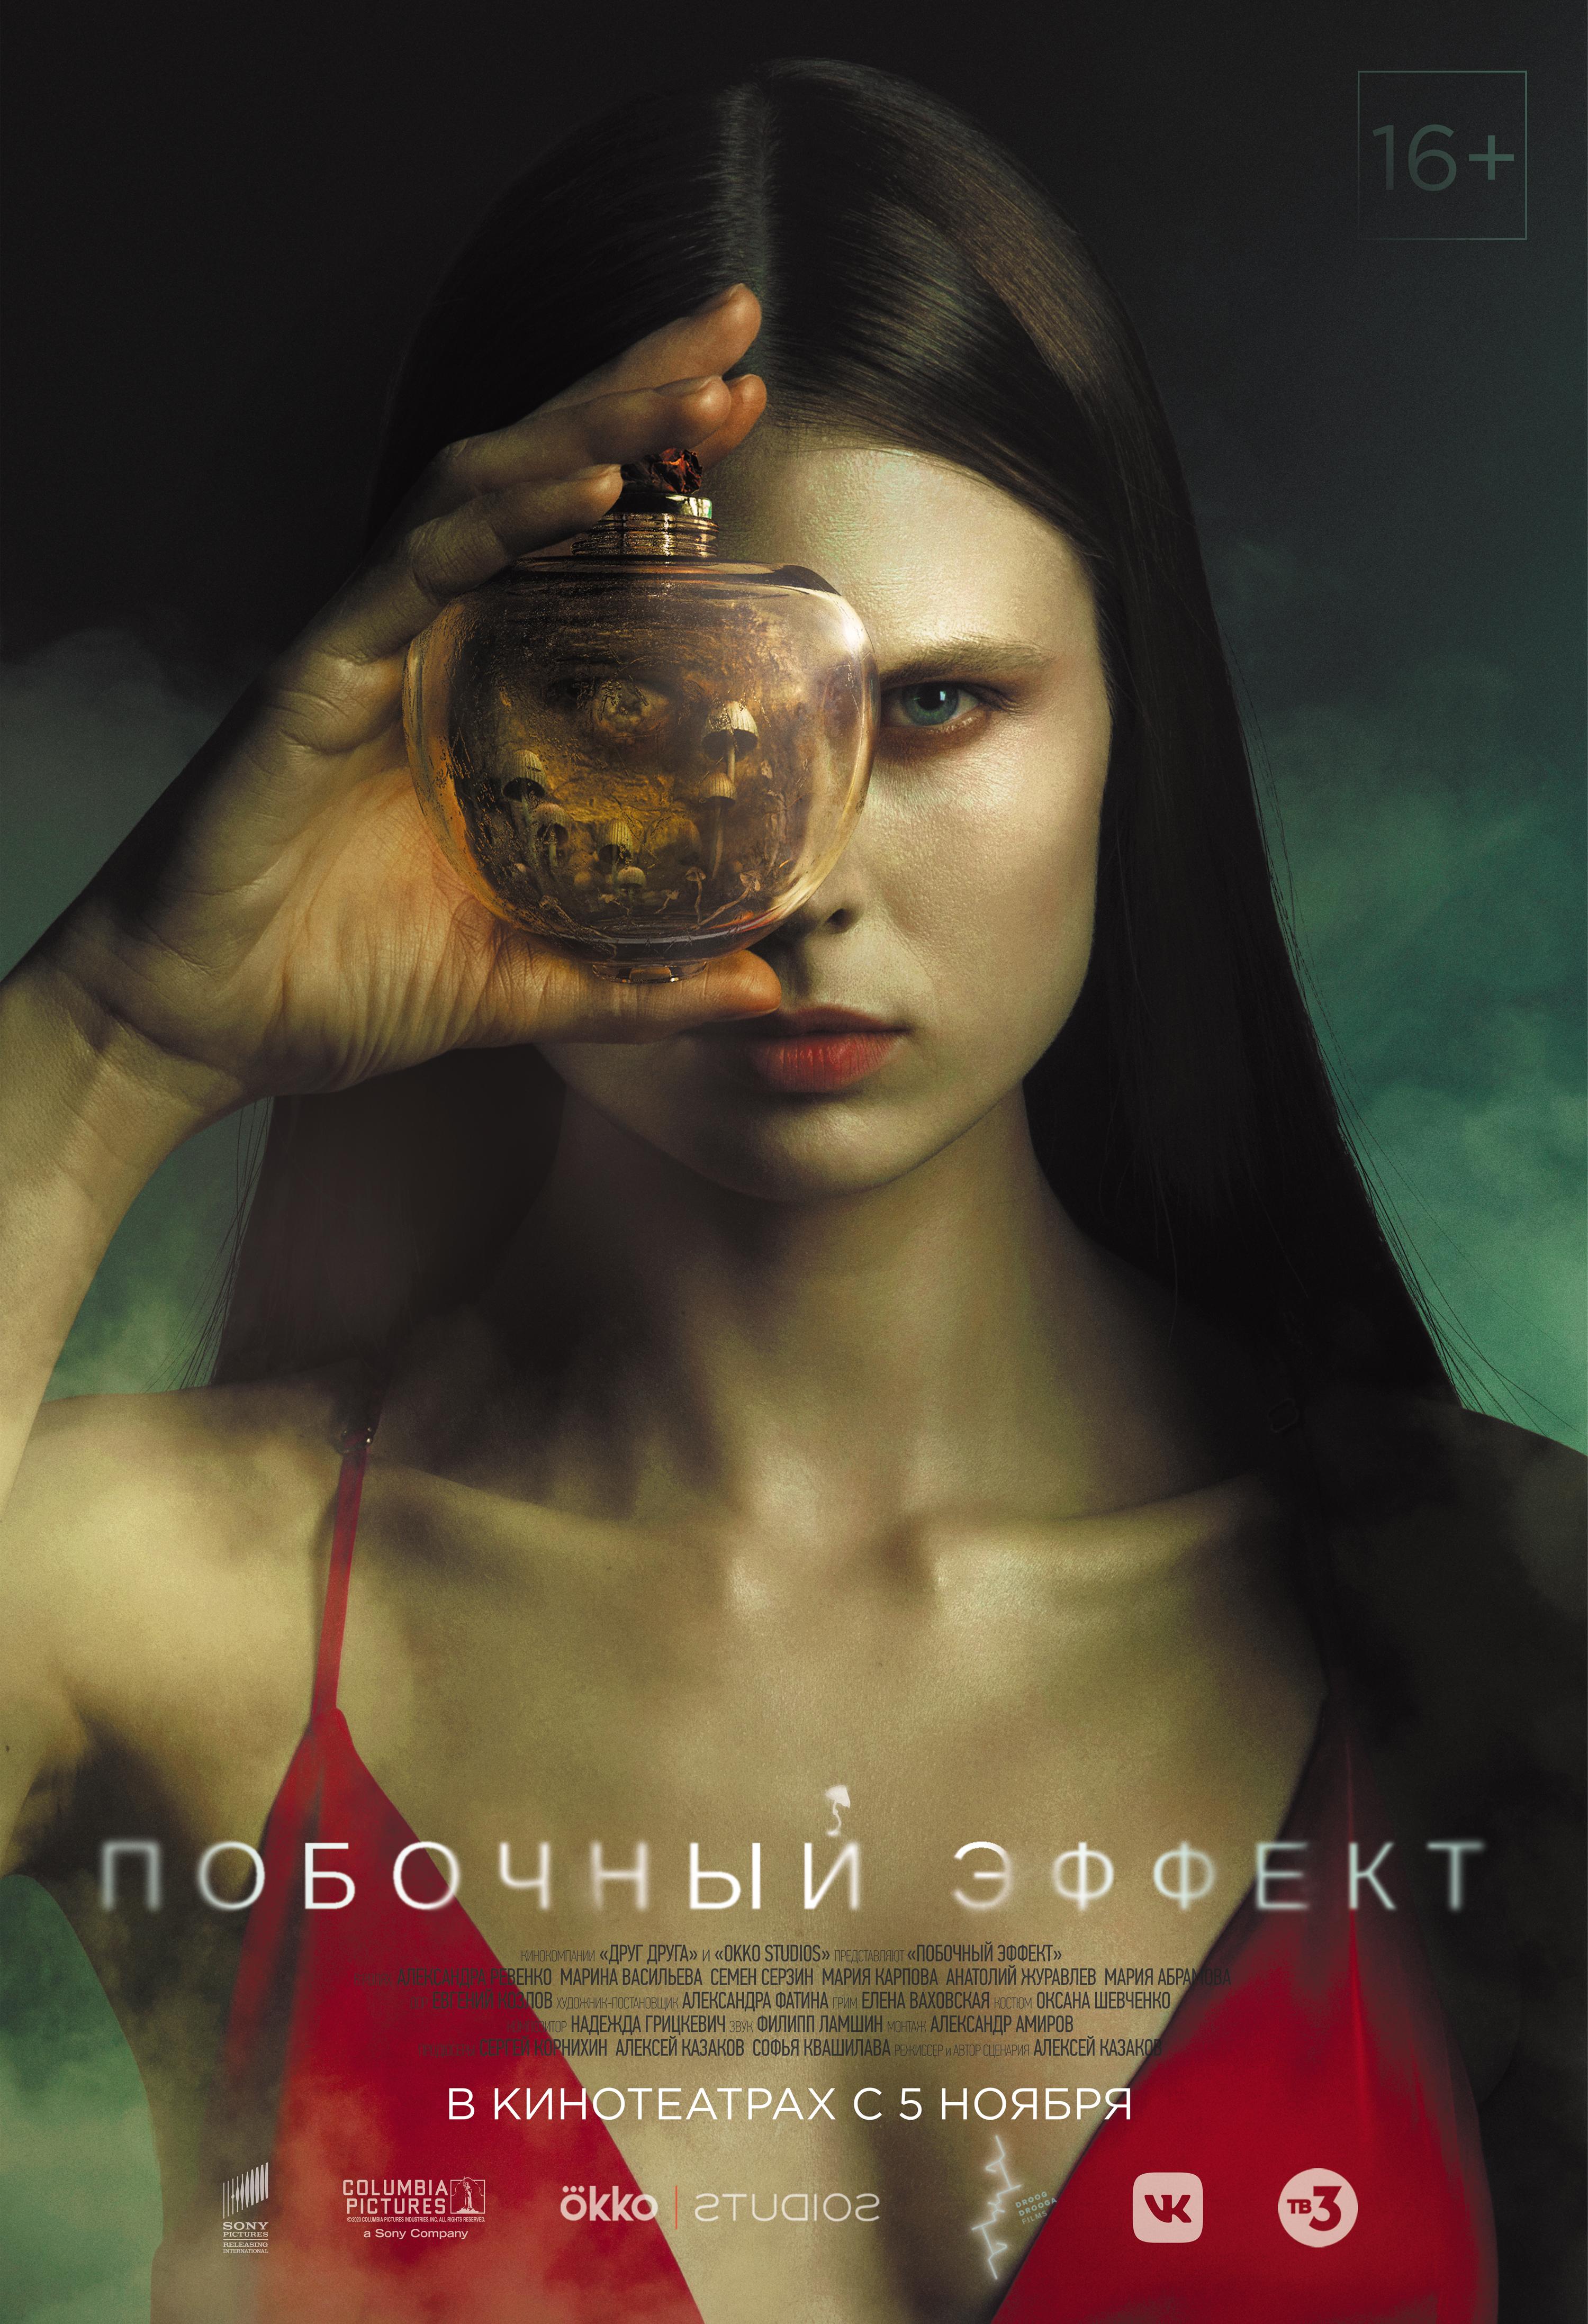 Aleksandra Revenko in Pobochnyi effekt (2020)